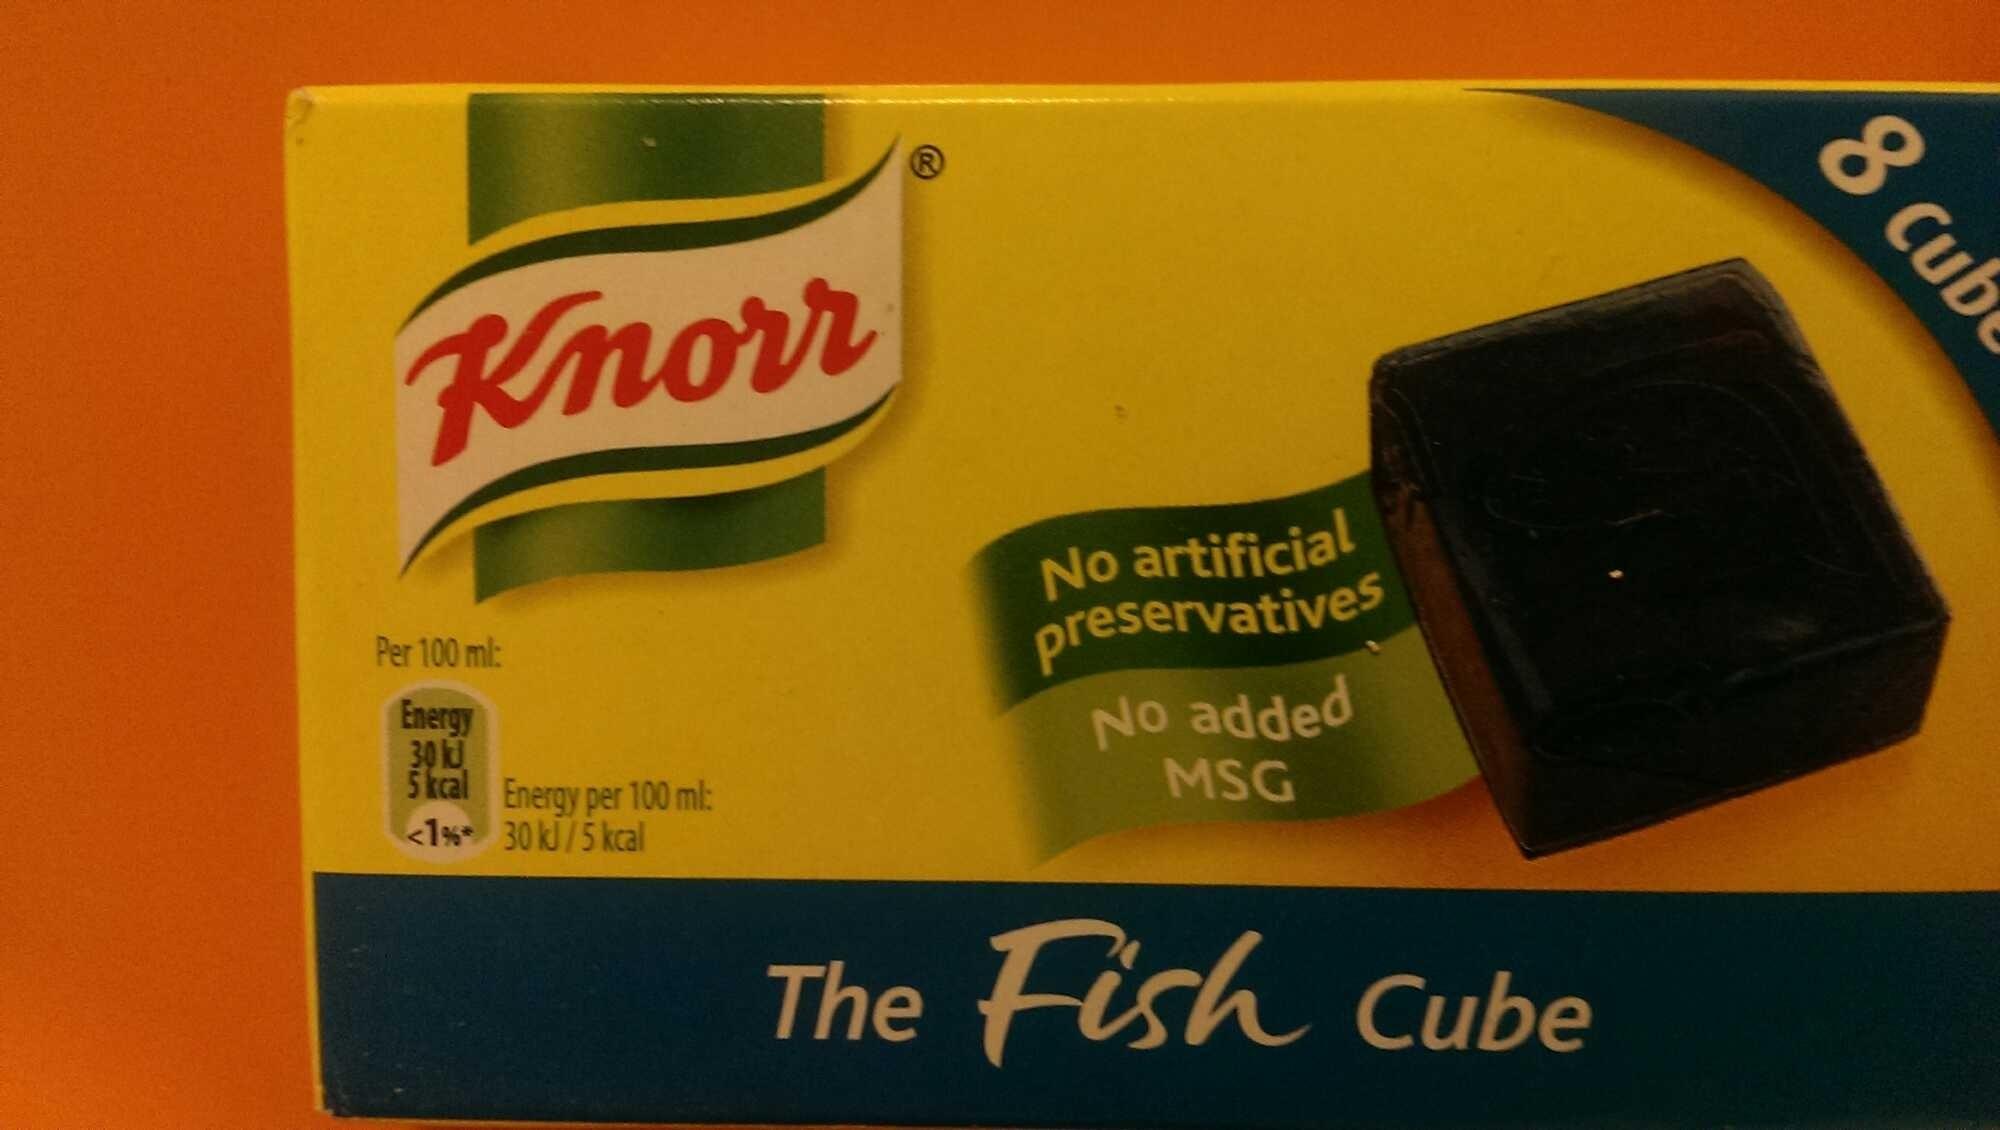 fish cube - Product